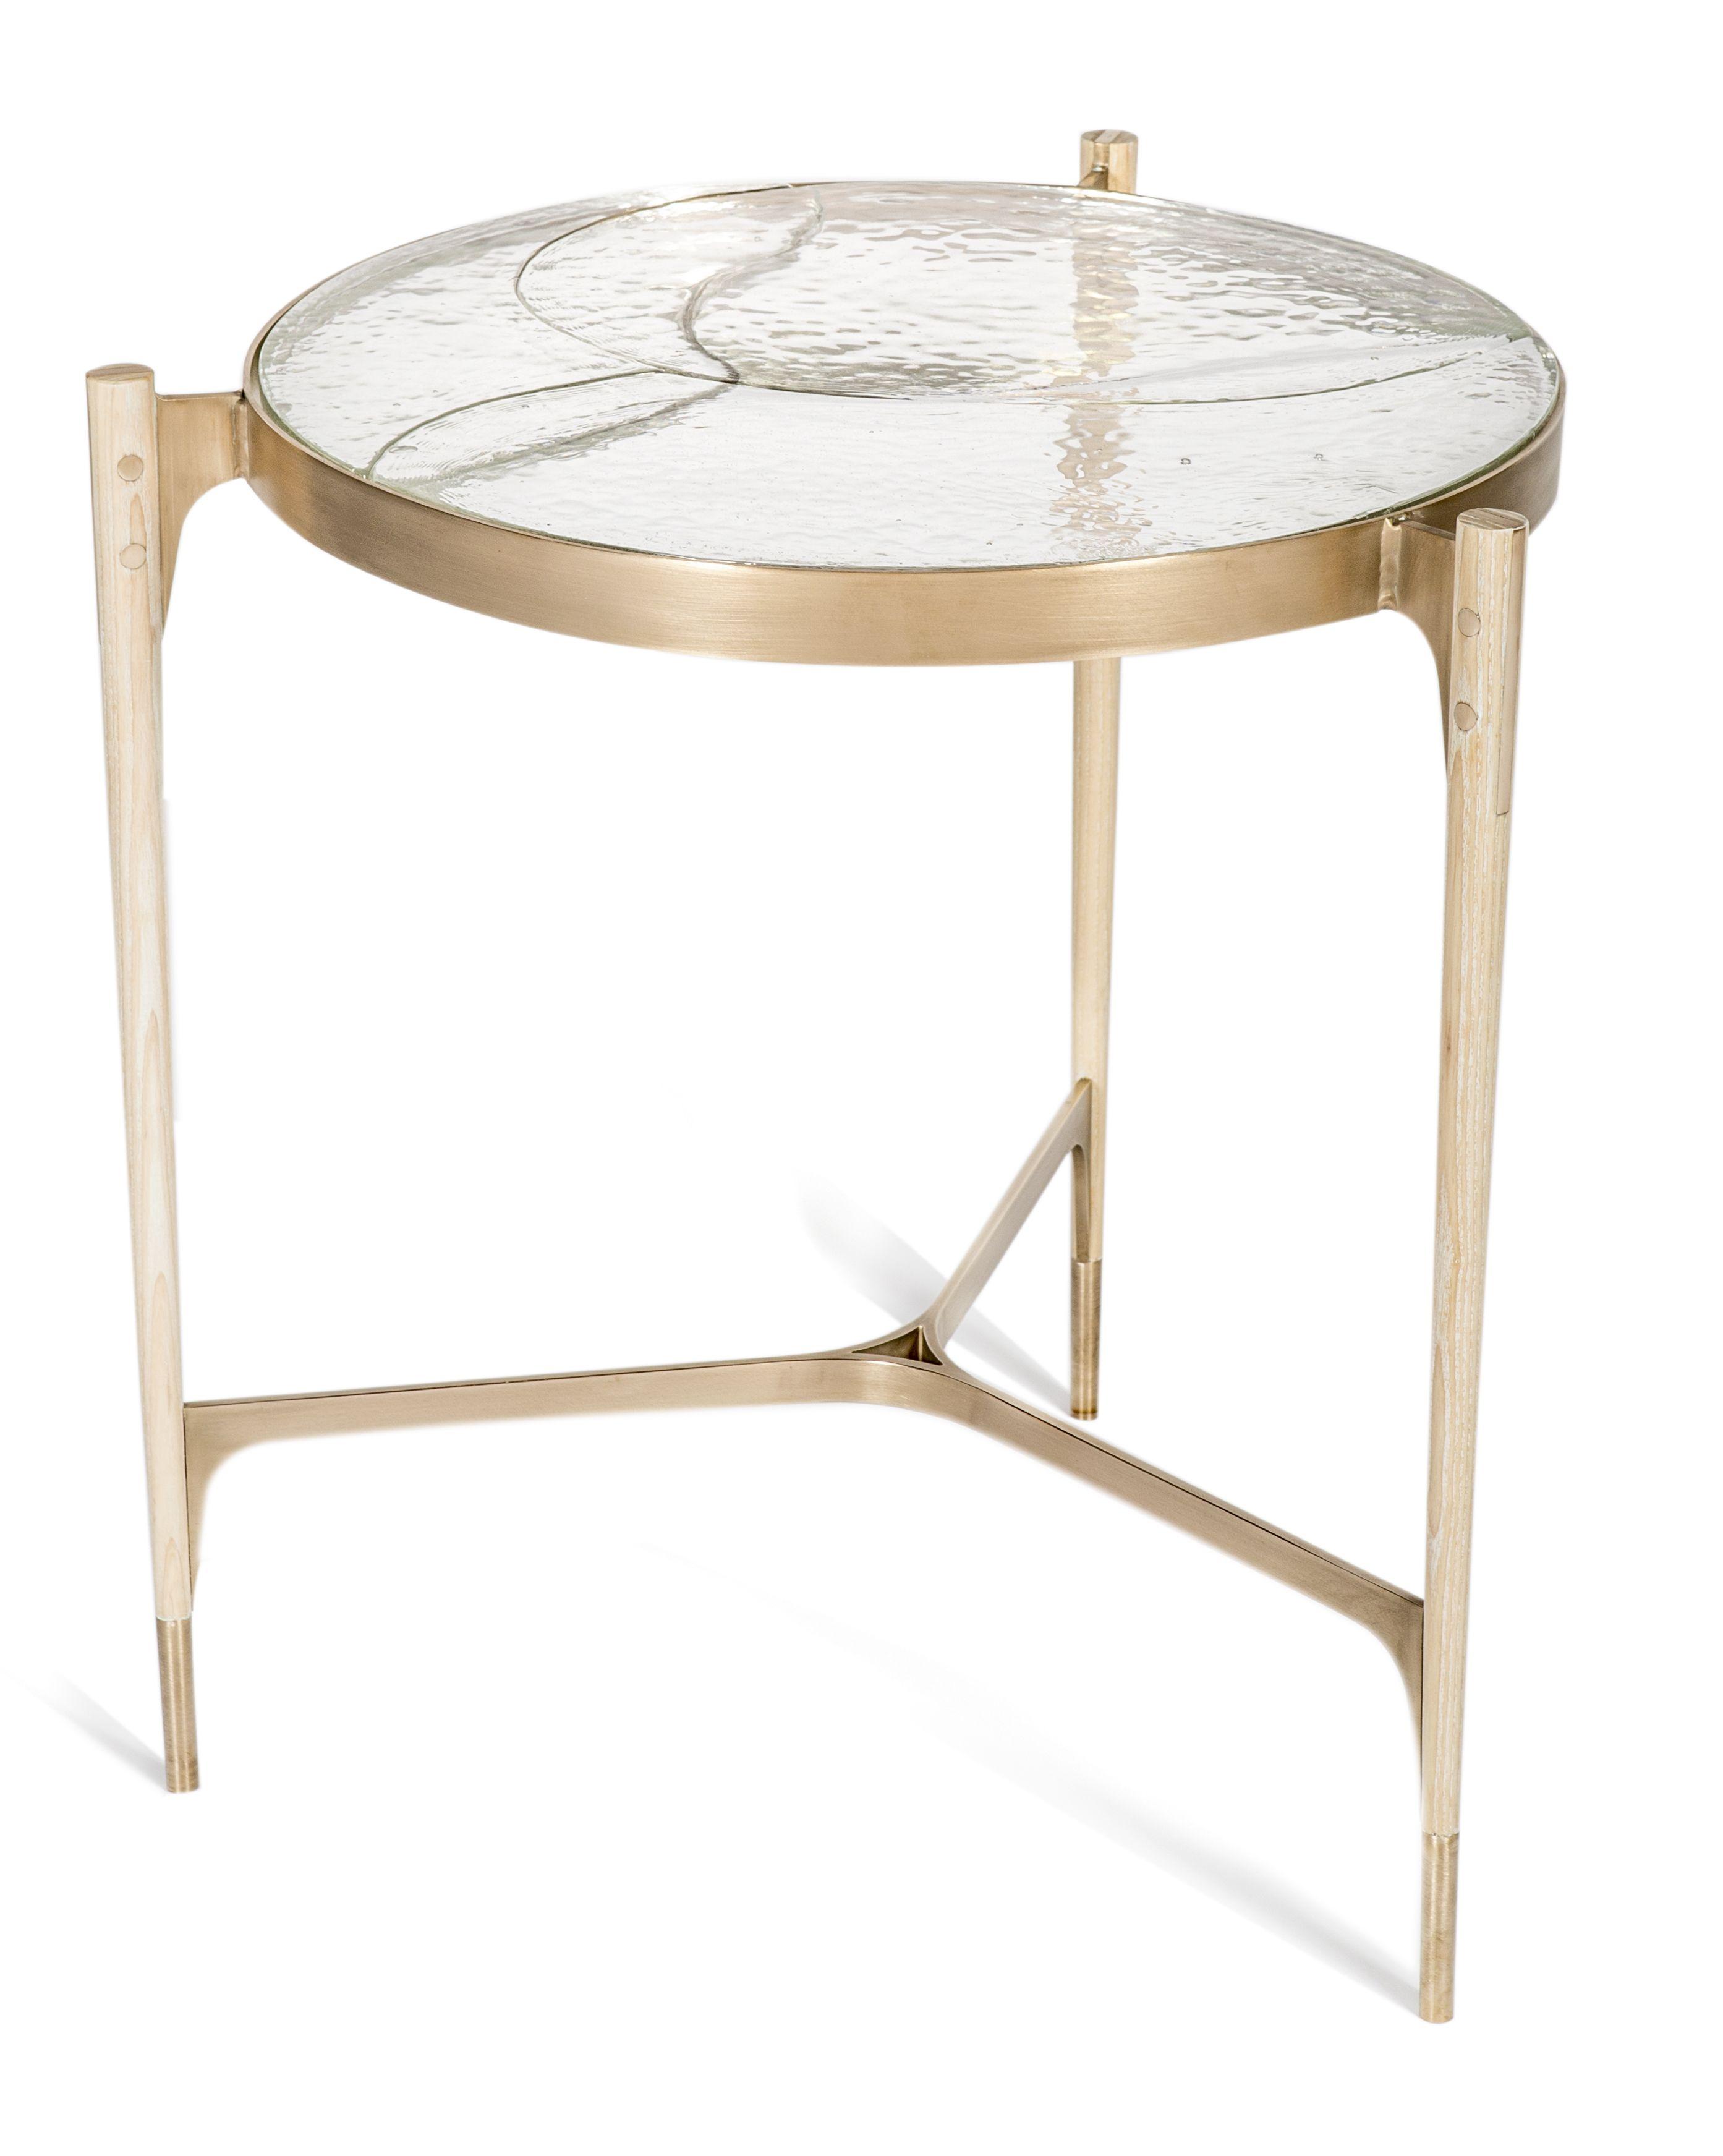 Modern wood side table  STITES SIDE TABLE  MidCentury  Modern Rustic  Folk Side Tables